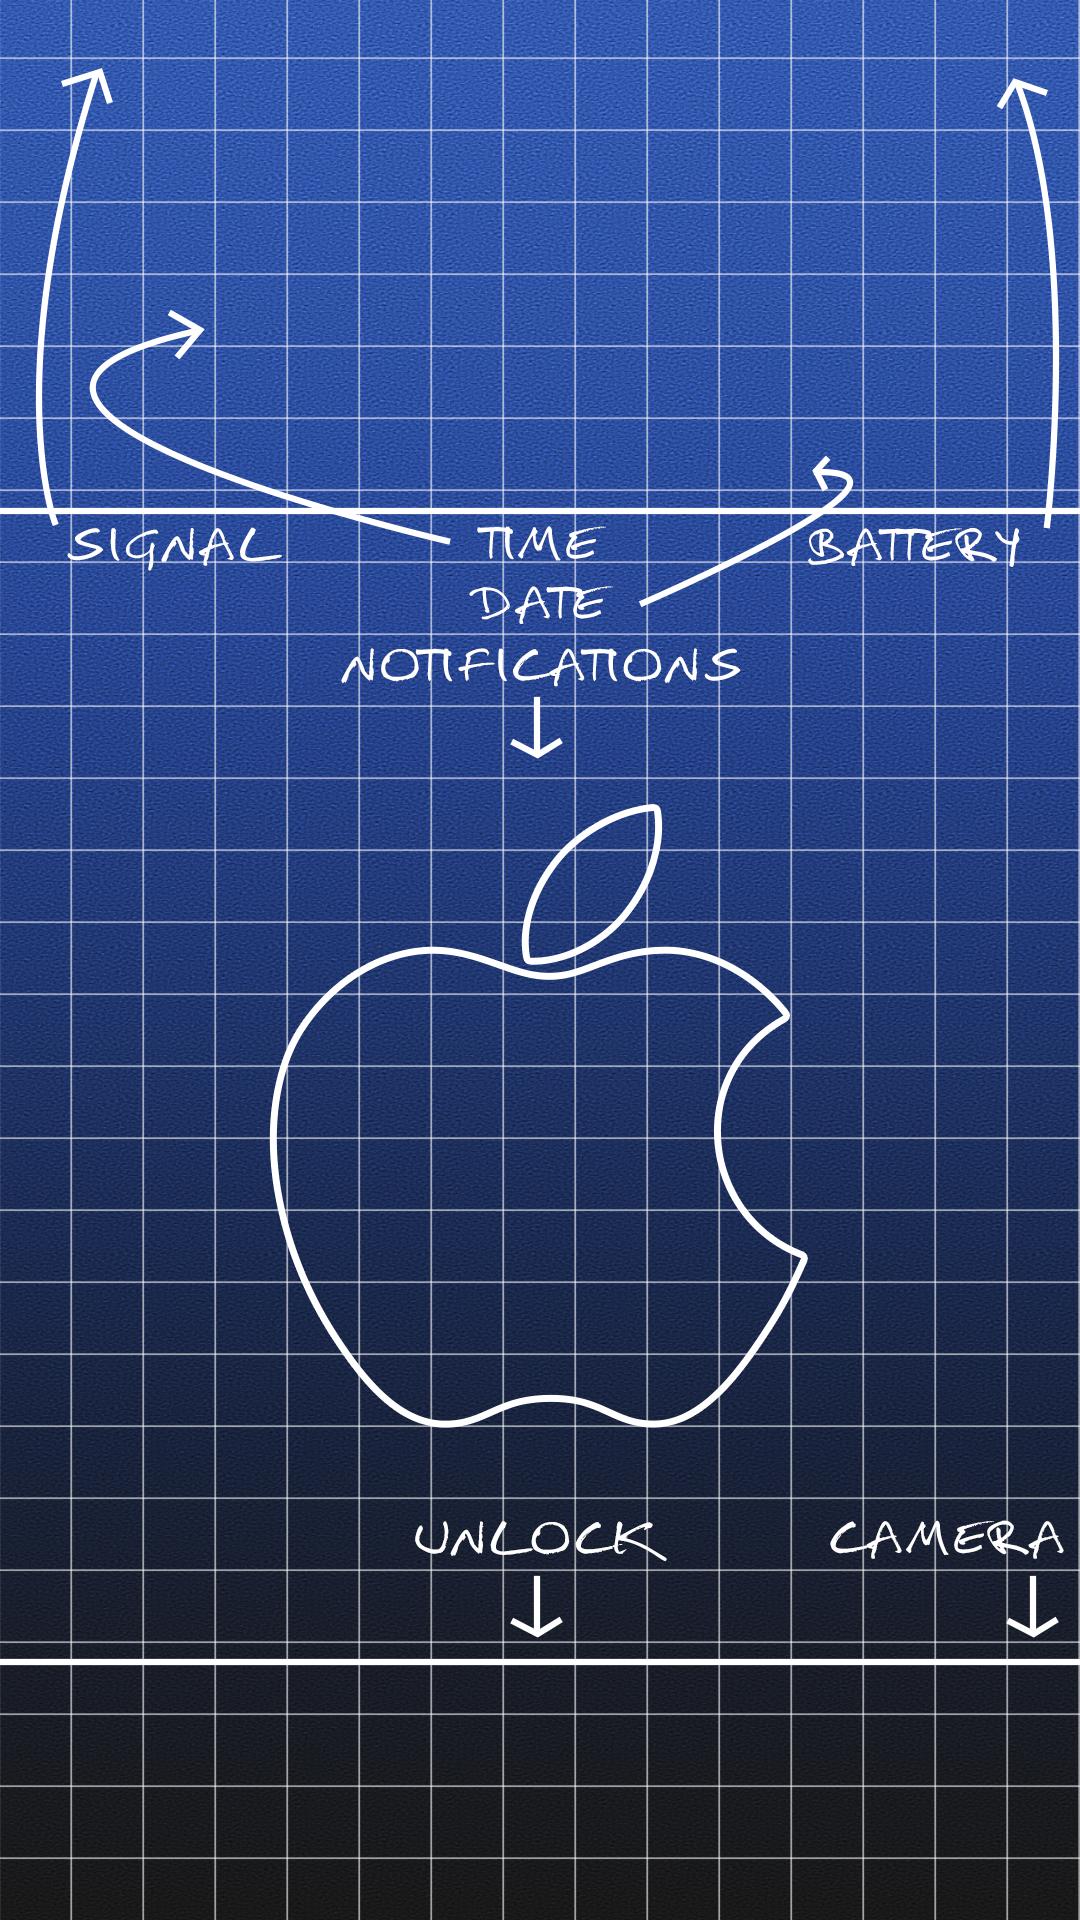 Unique wallpaper for you iPhone 6 Plus lockscreen | Wallpapers | Iphone wallpaper, Wallpaper ...